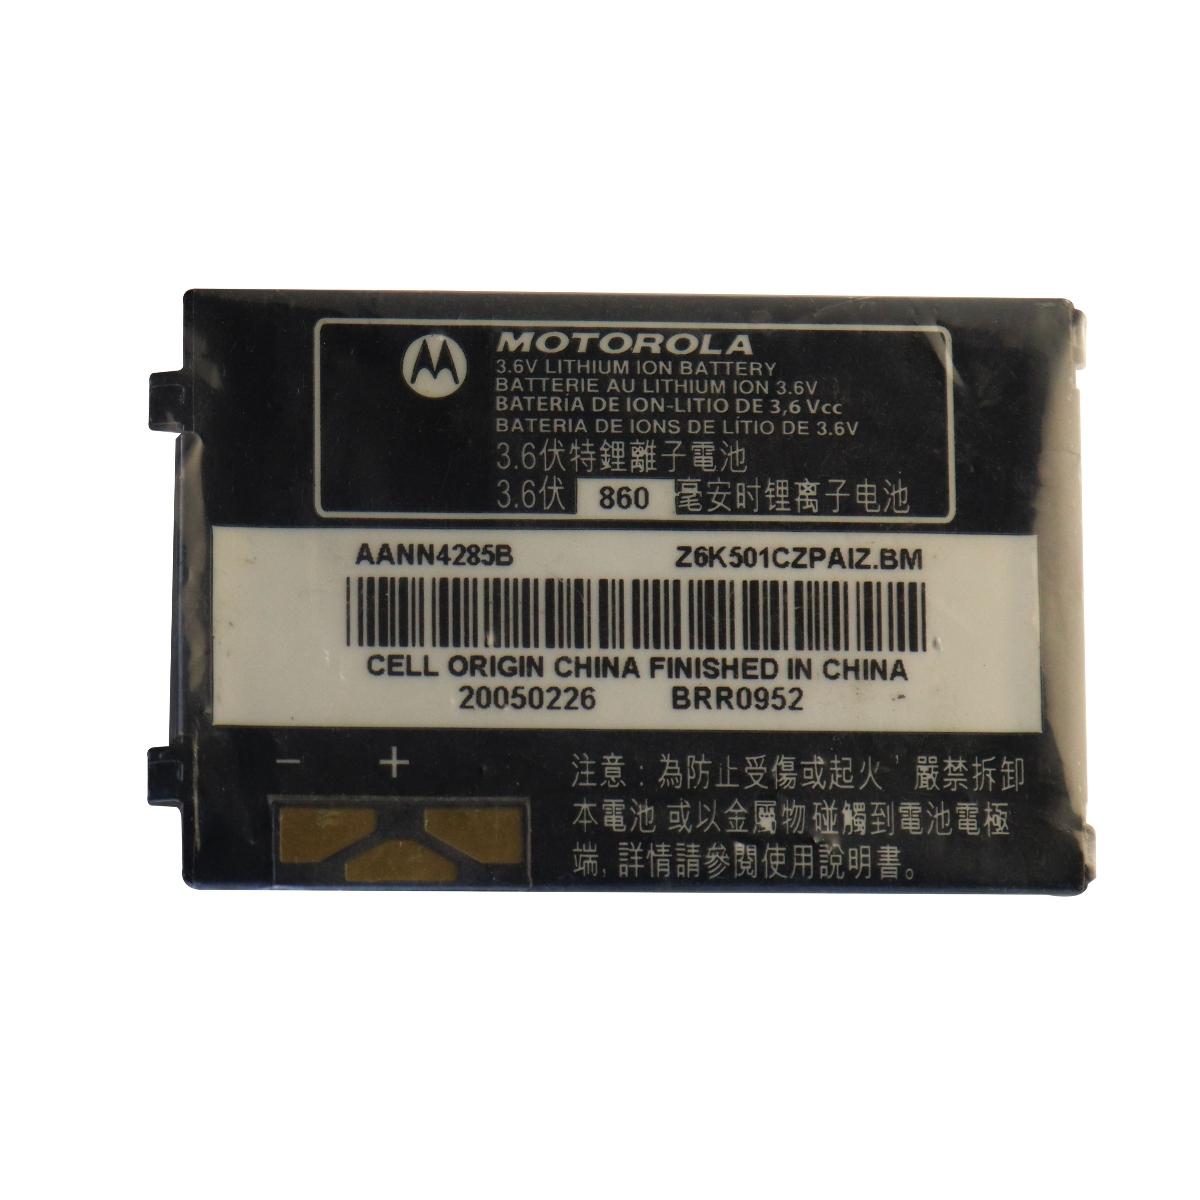 OEM Motorola AANN4285B 860 mAh Replacement Battery for Motorola V180/V188